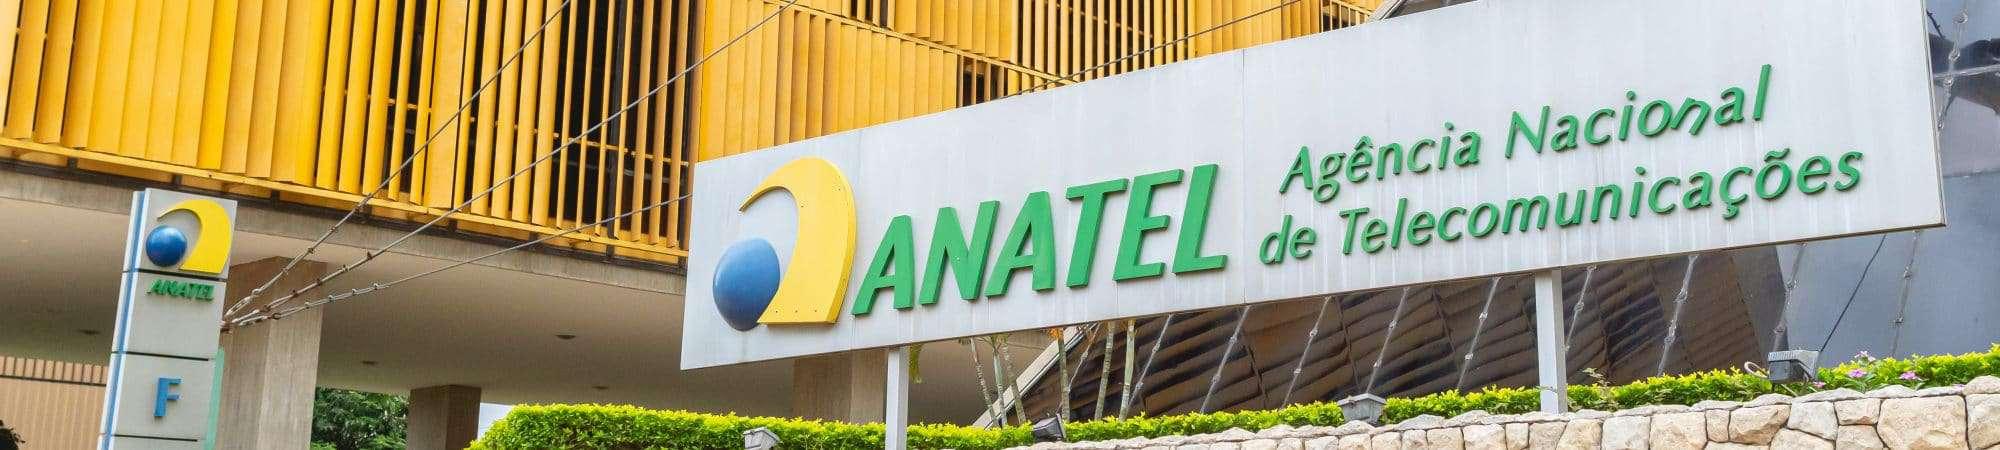 Anatel. Imagen: Shutterstock